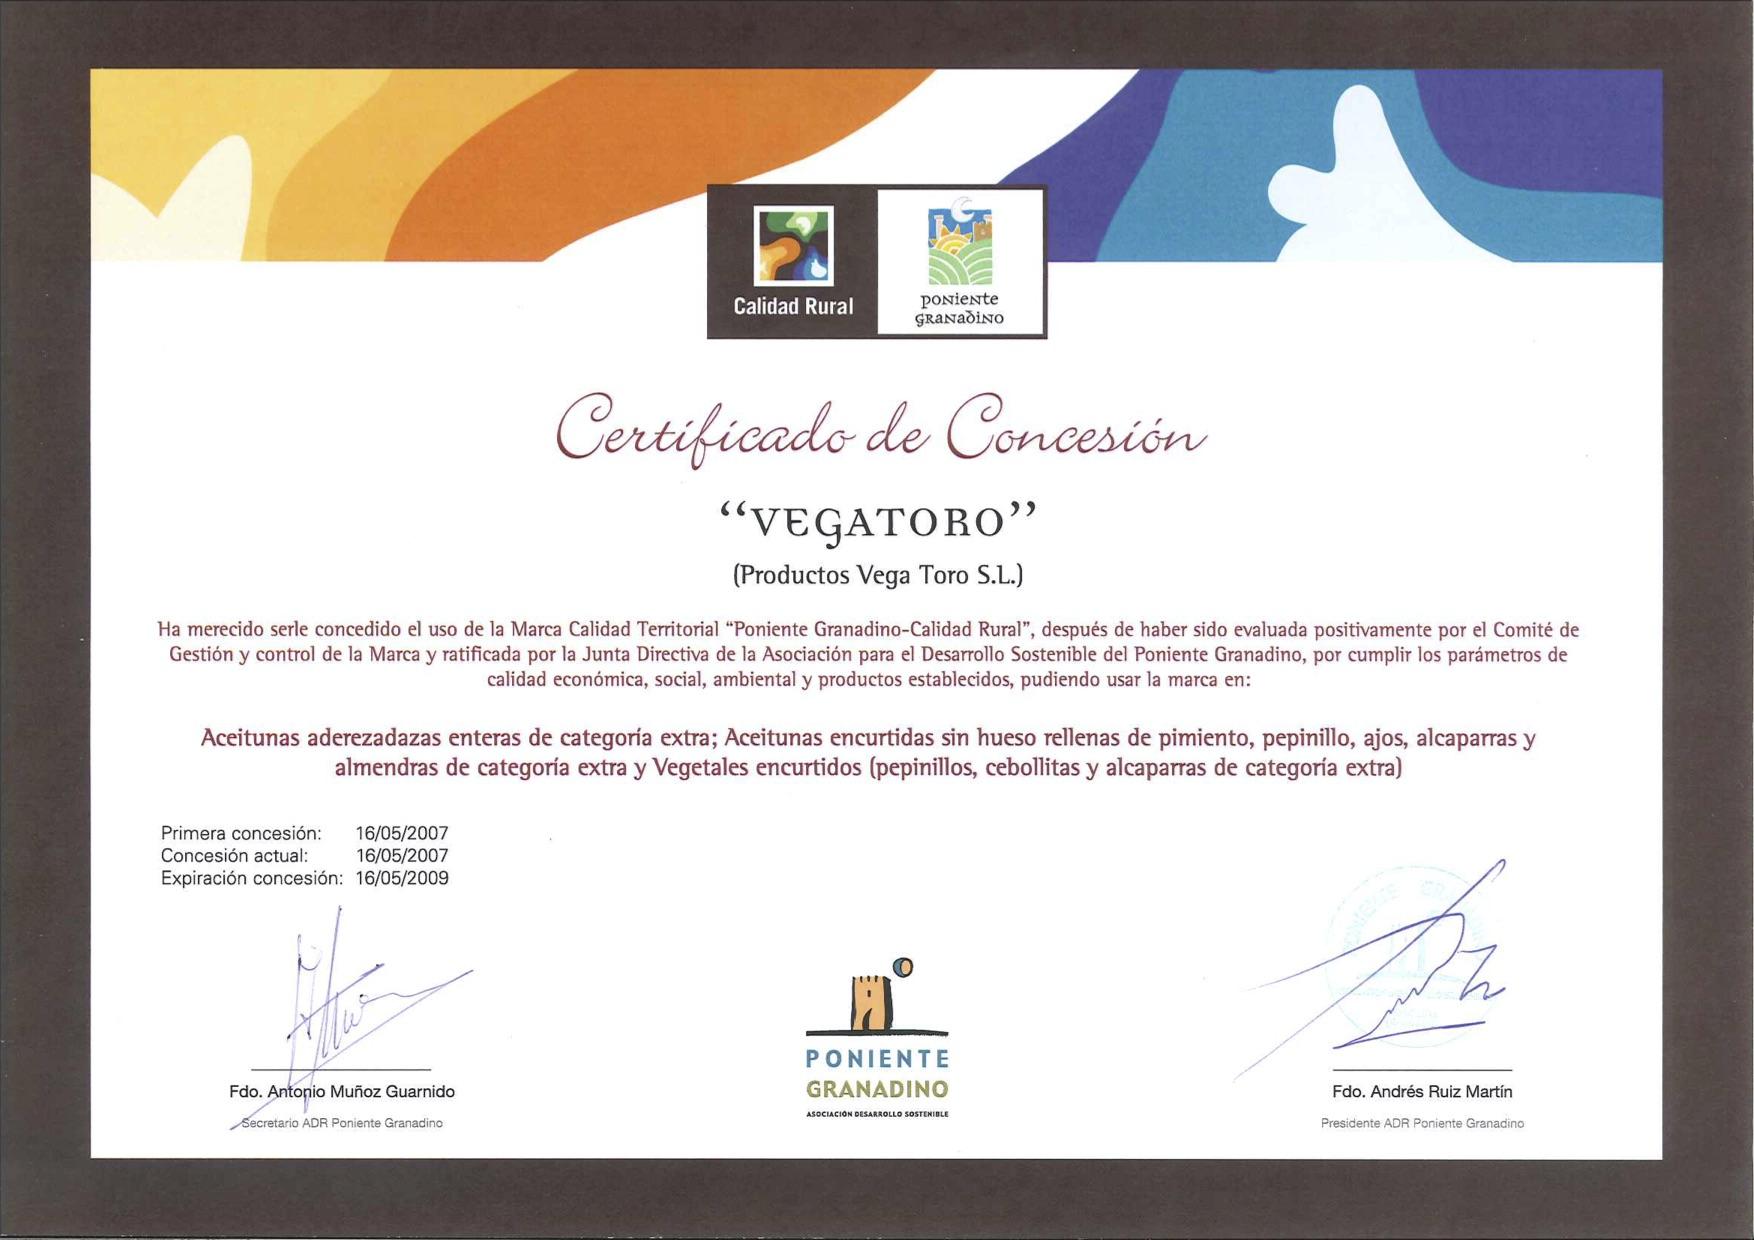 vegatoro-certificado-calidad-rural